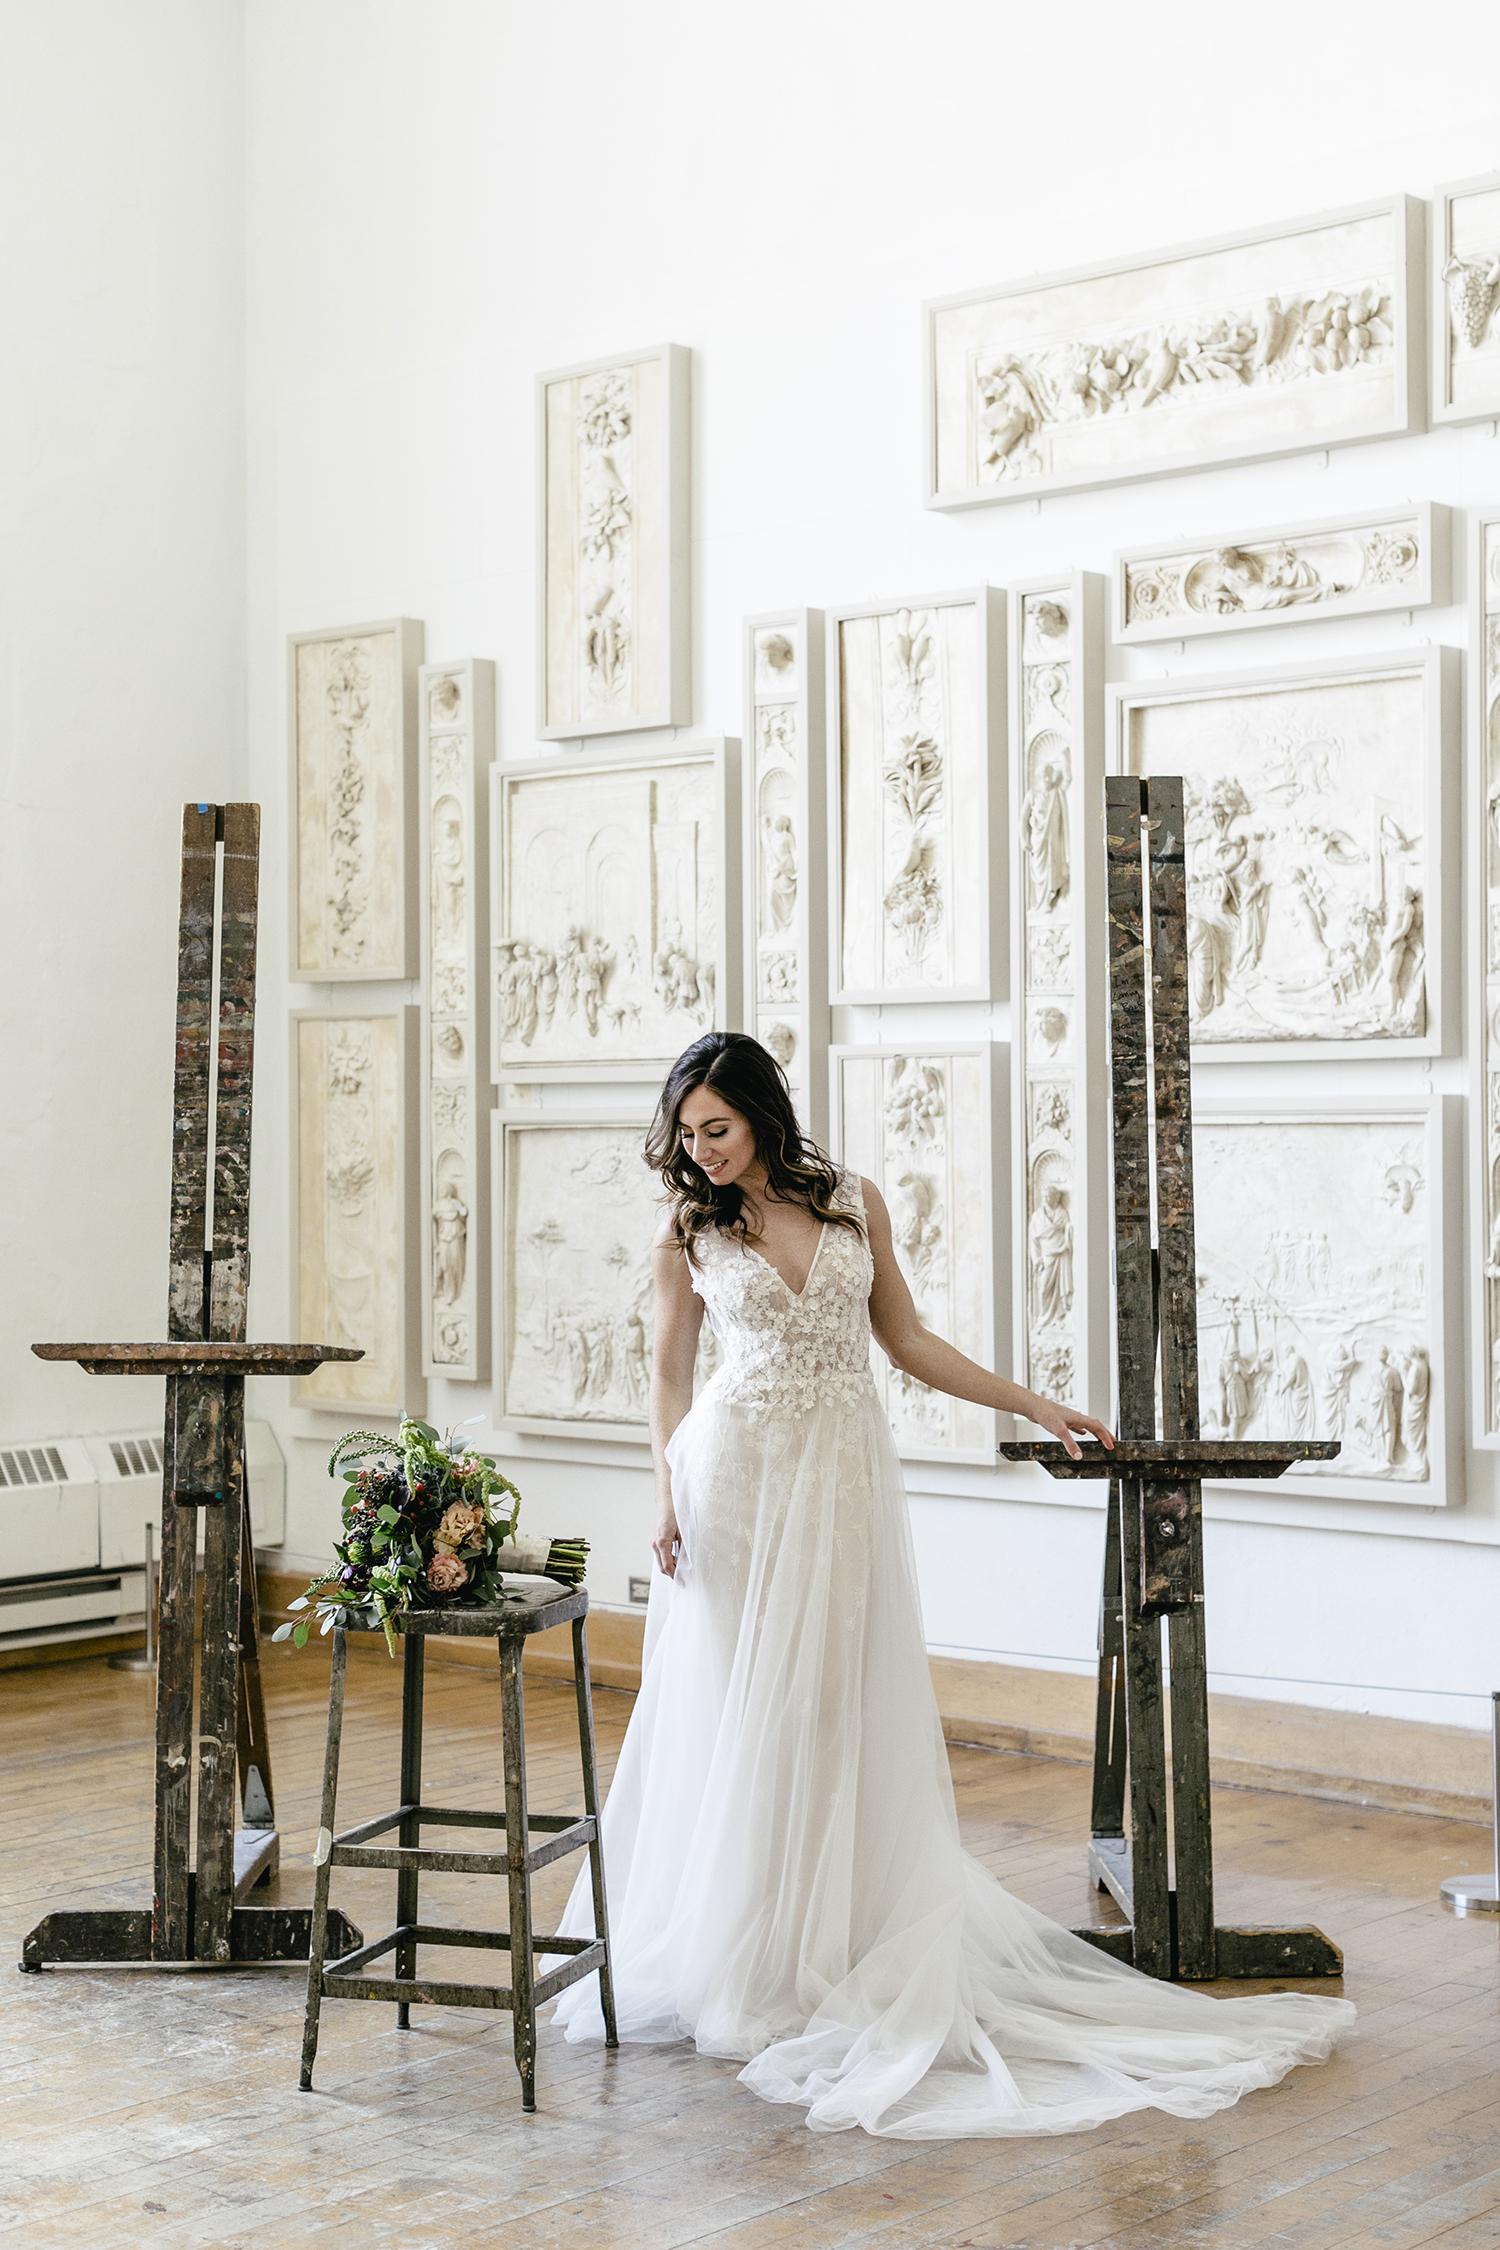 photography-wedding-weddings-natural-candid-pafa-pennsylvania academy-philadephia-philly-philadelphia wedding-mixed race-editorial-modern-fine-art-024.JPG